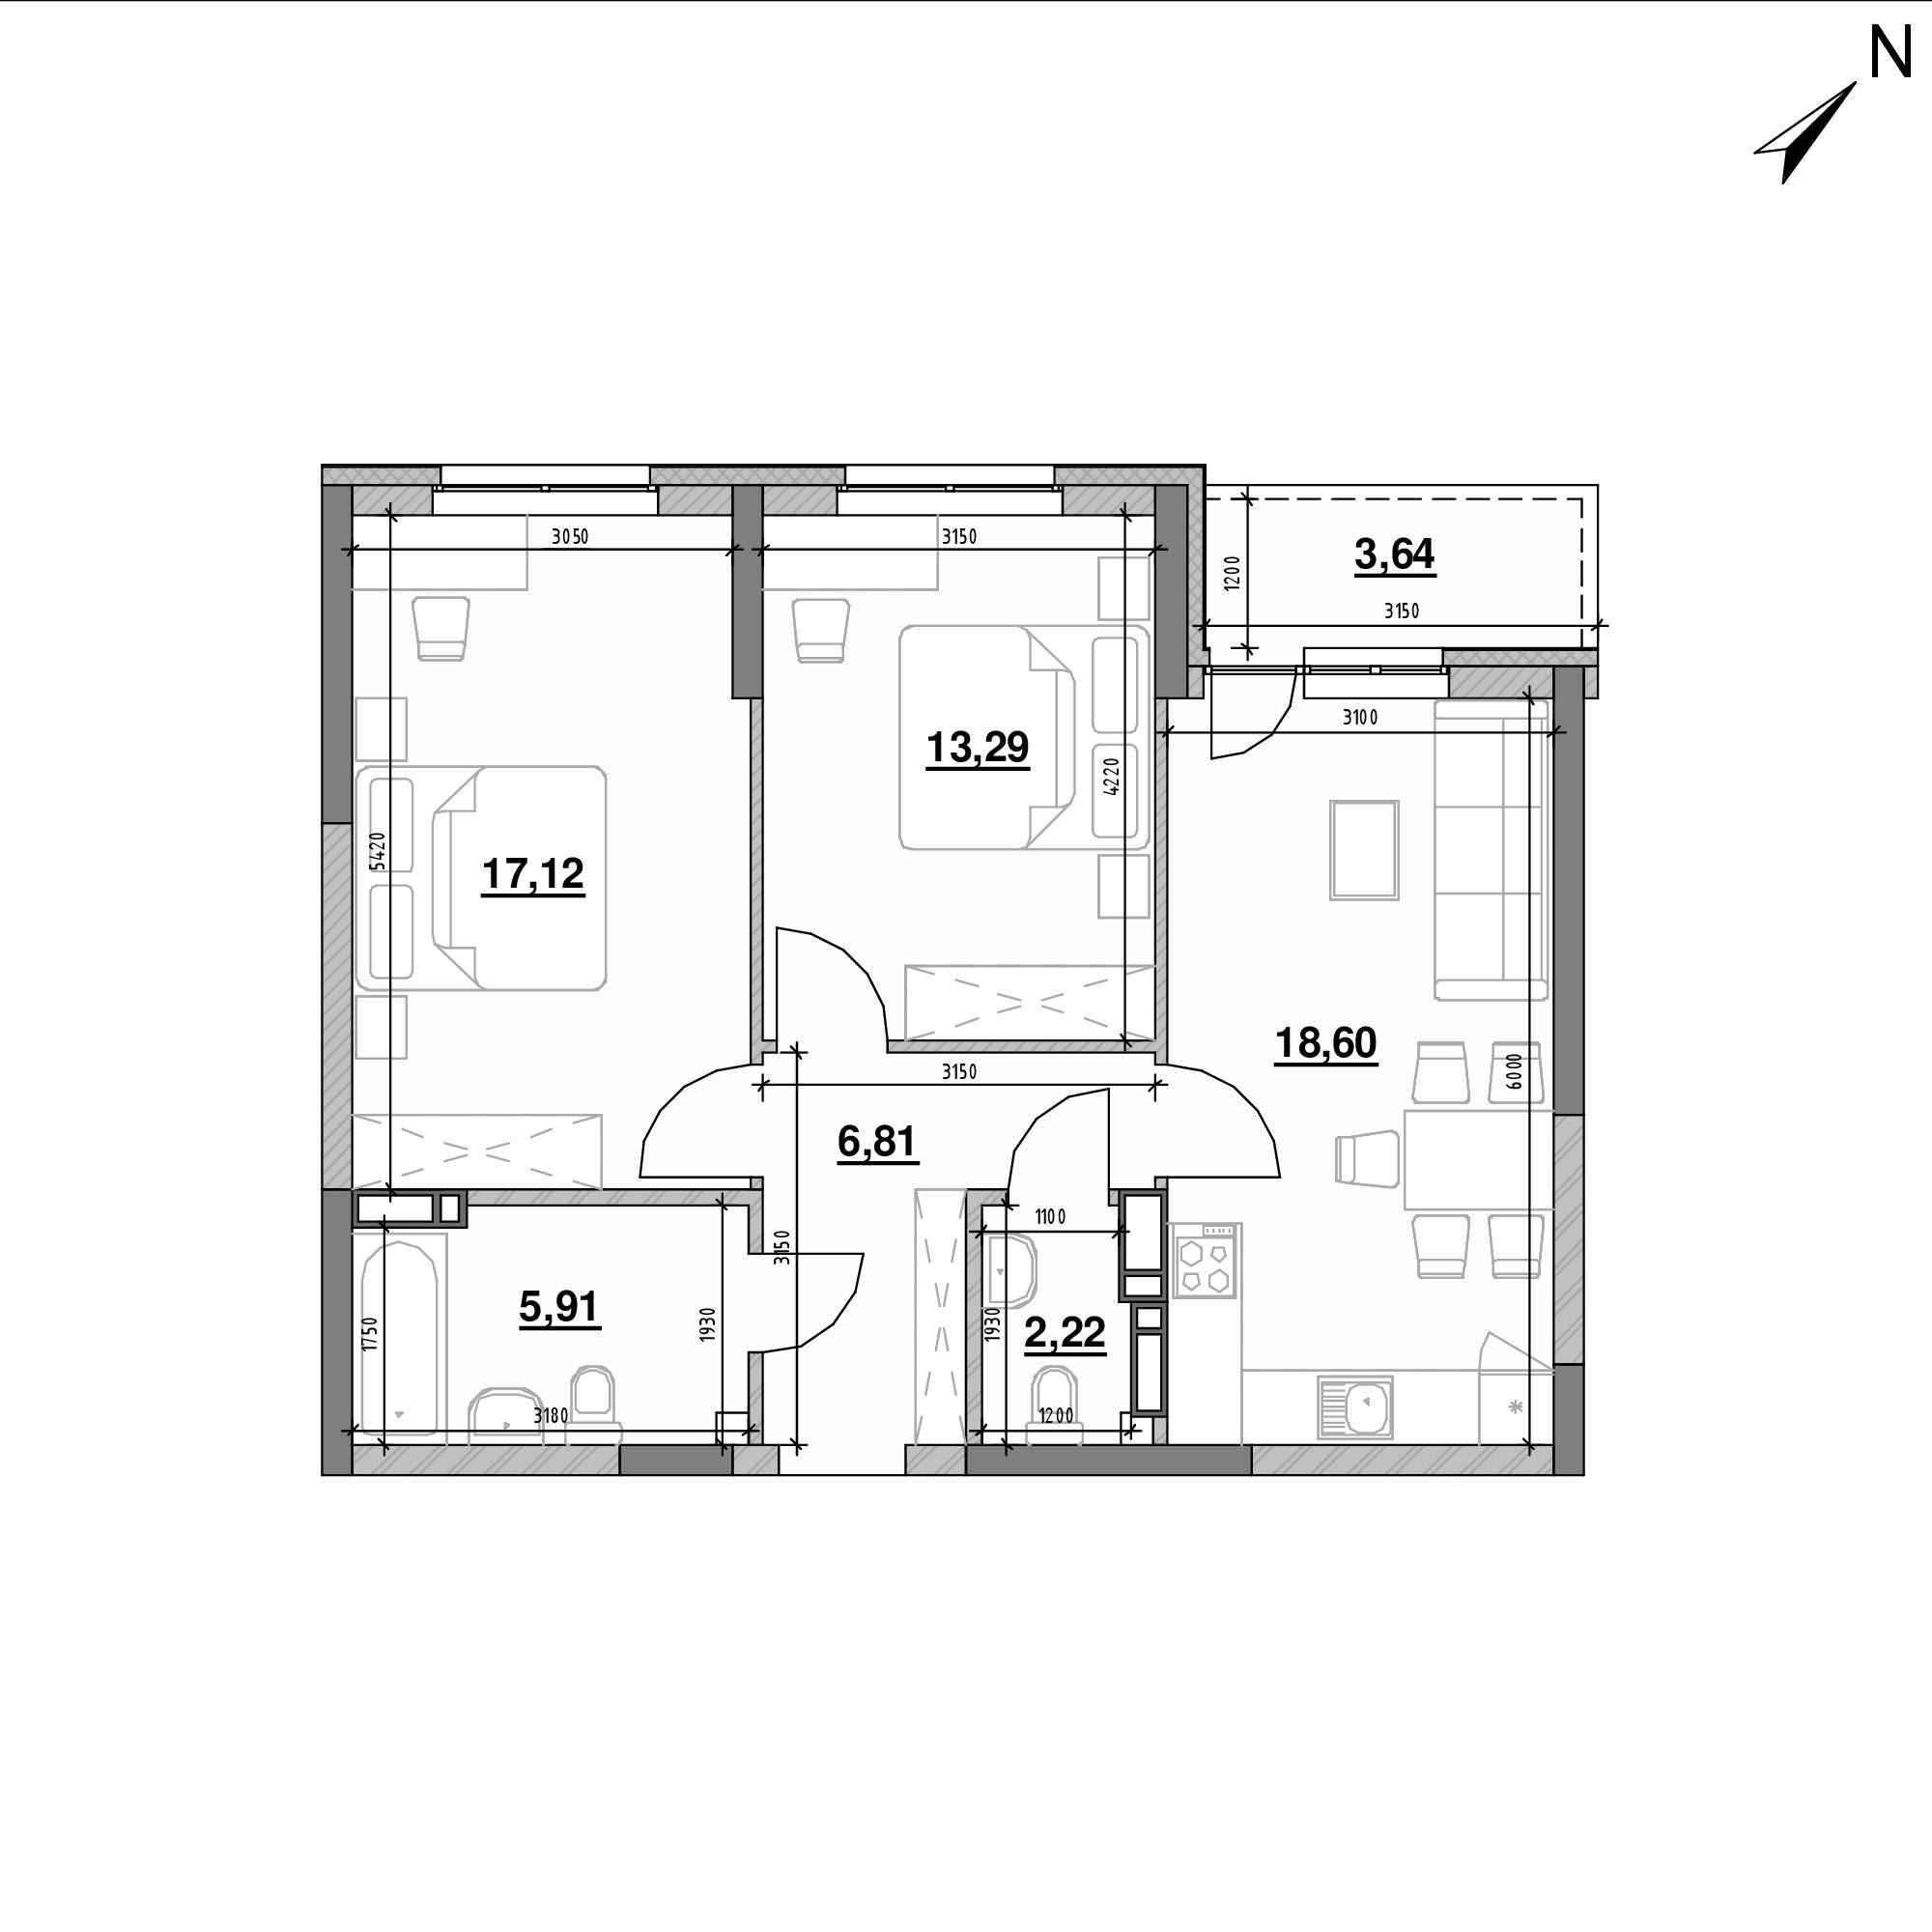 ЖК Оk'Land: планування 2-кімнатної квартири, №554, 67.59 м<sup>2</sup>